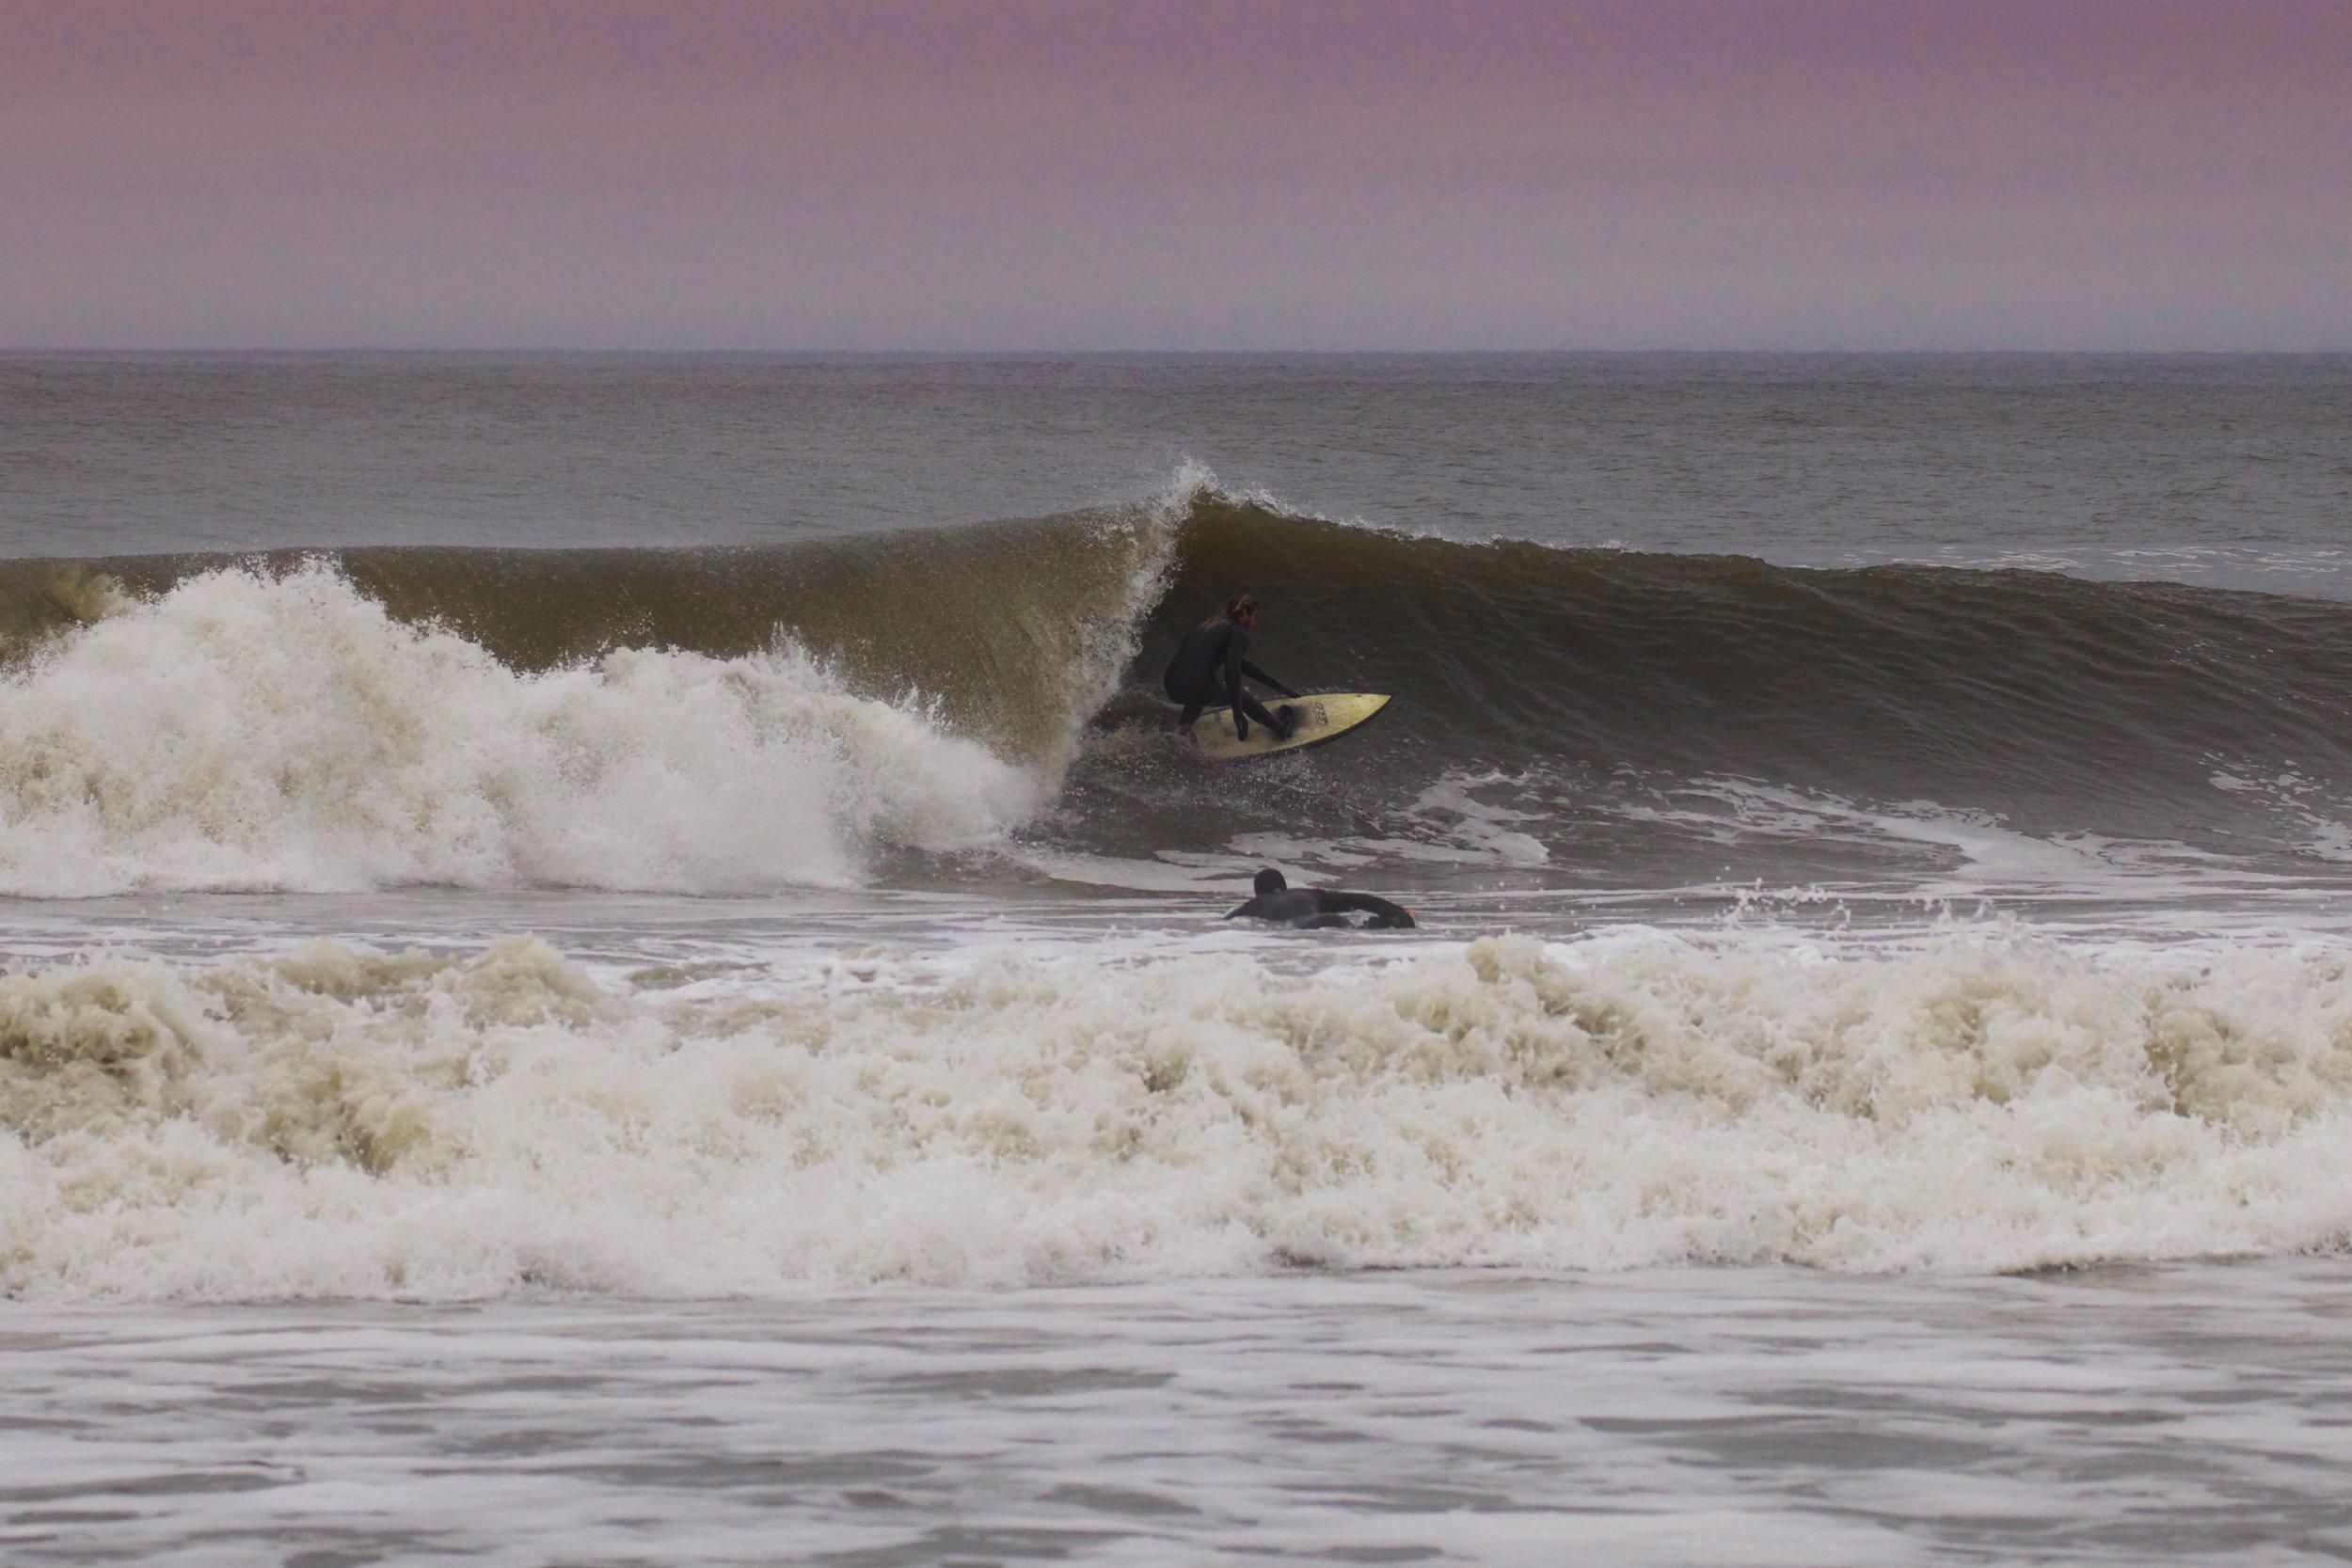 4-26-17 Long Beach Surfer 3 2017.jpg